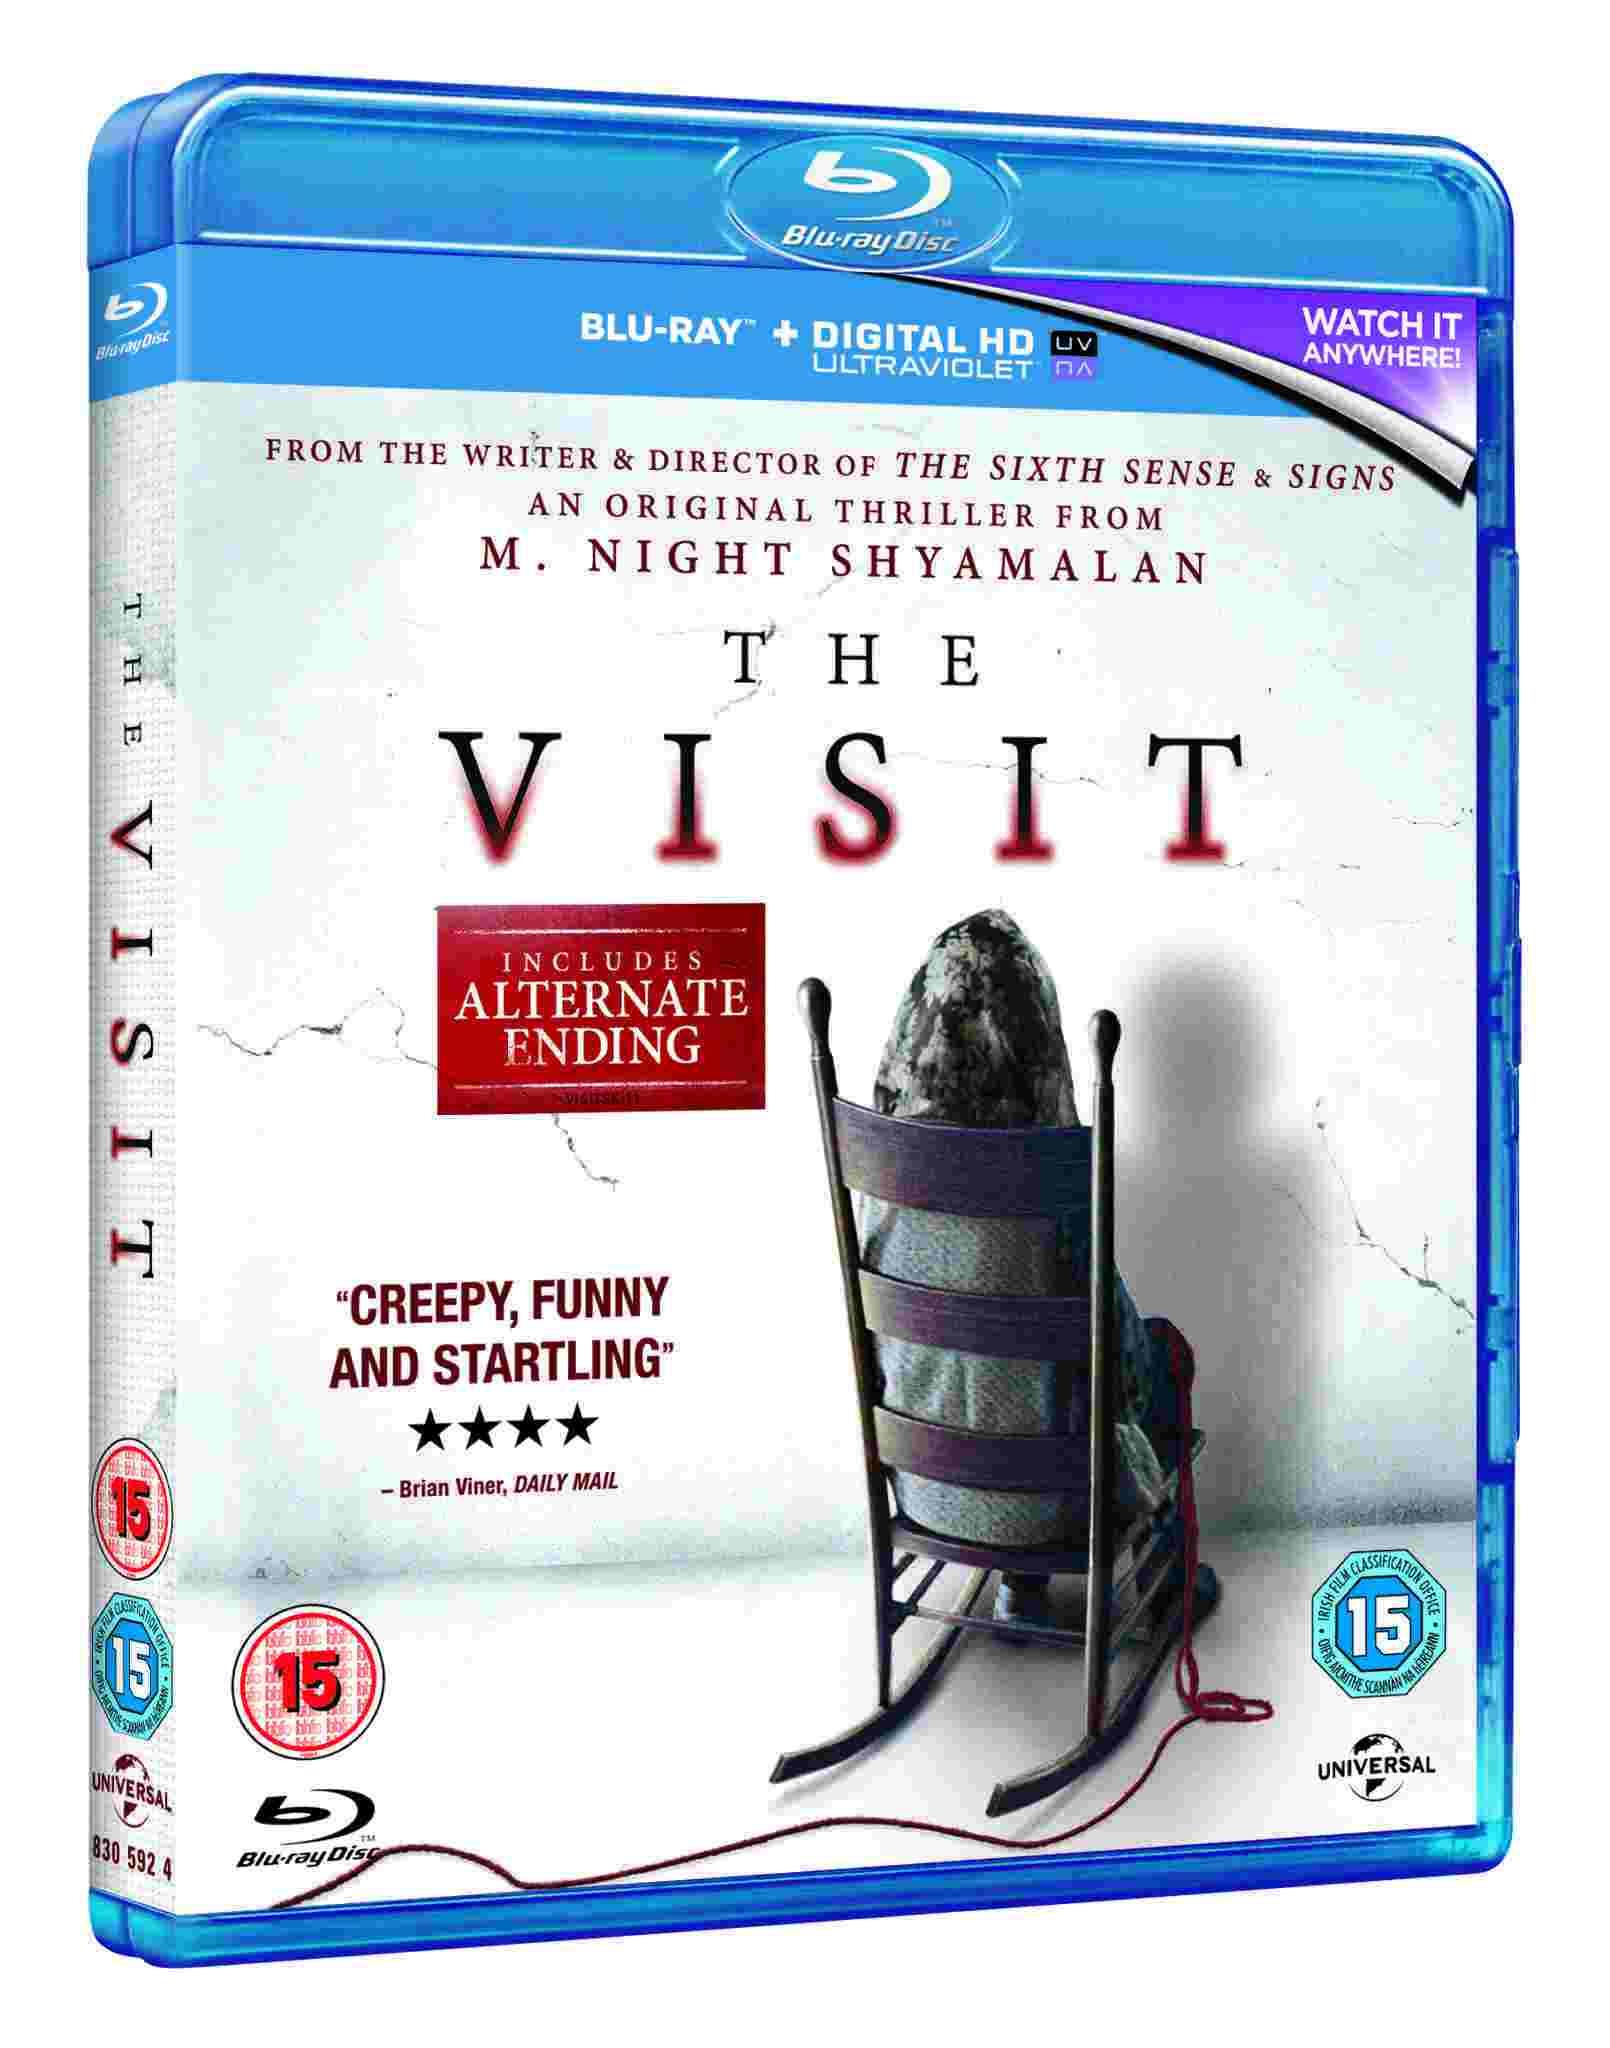 8305924-11 The Visit UK BD Retail Sleeve sticker